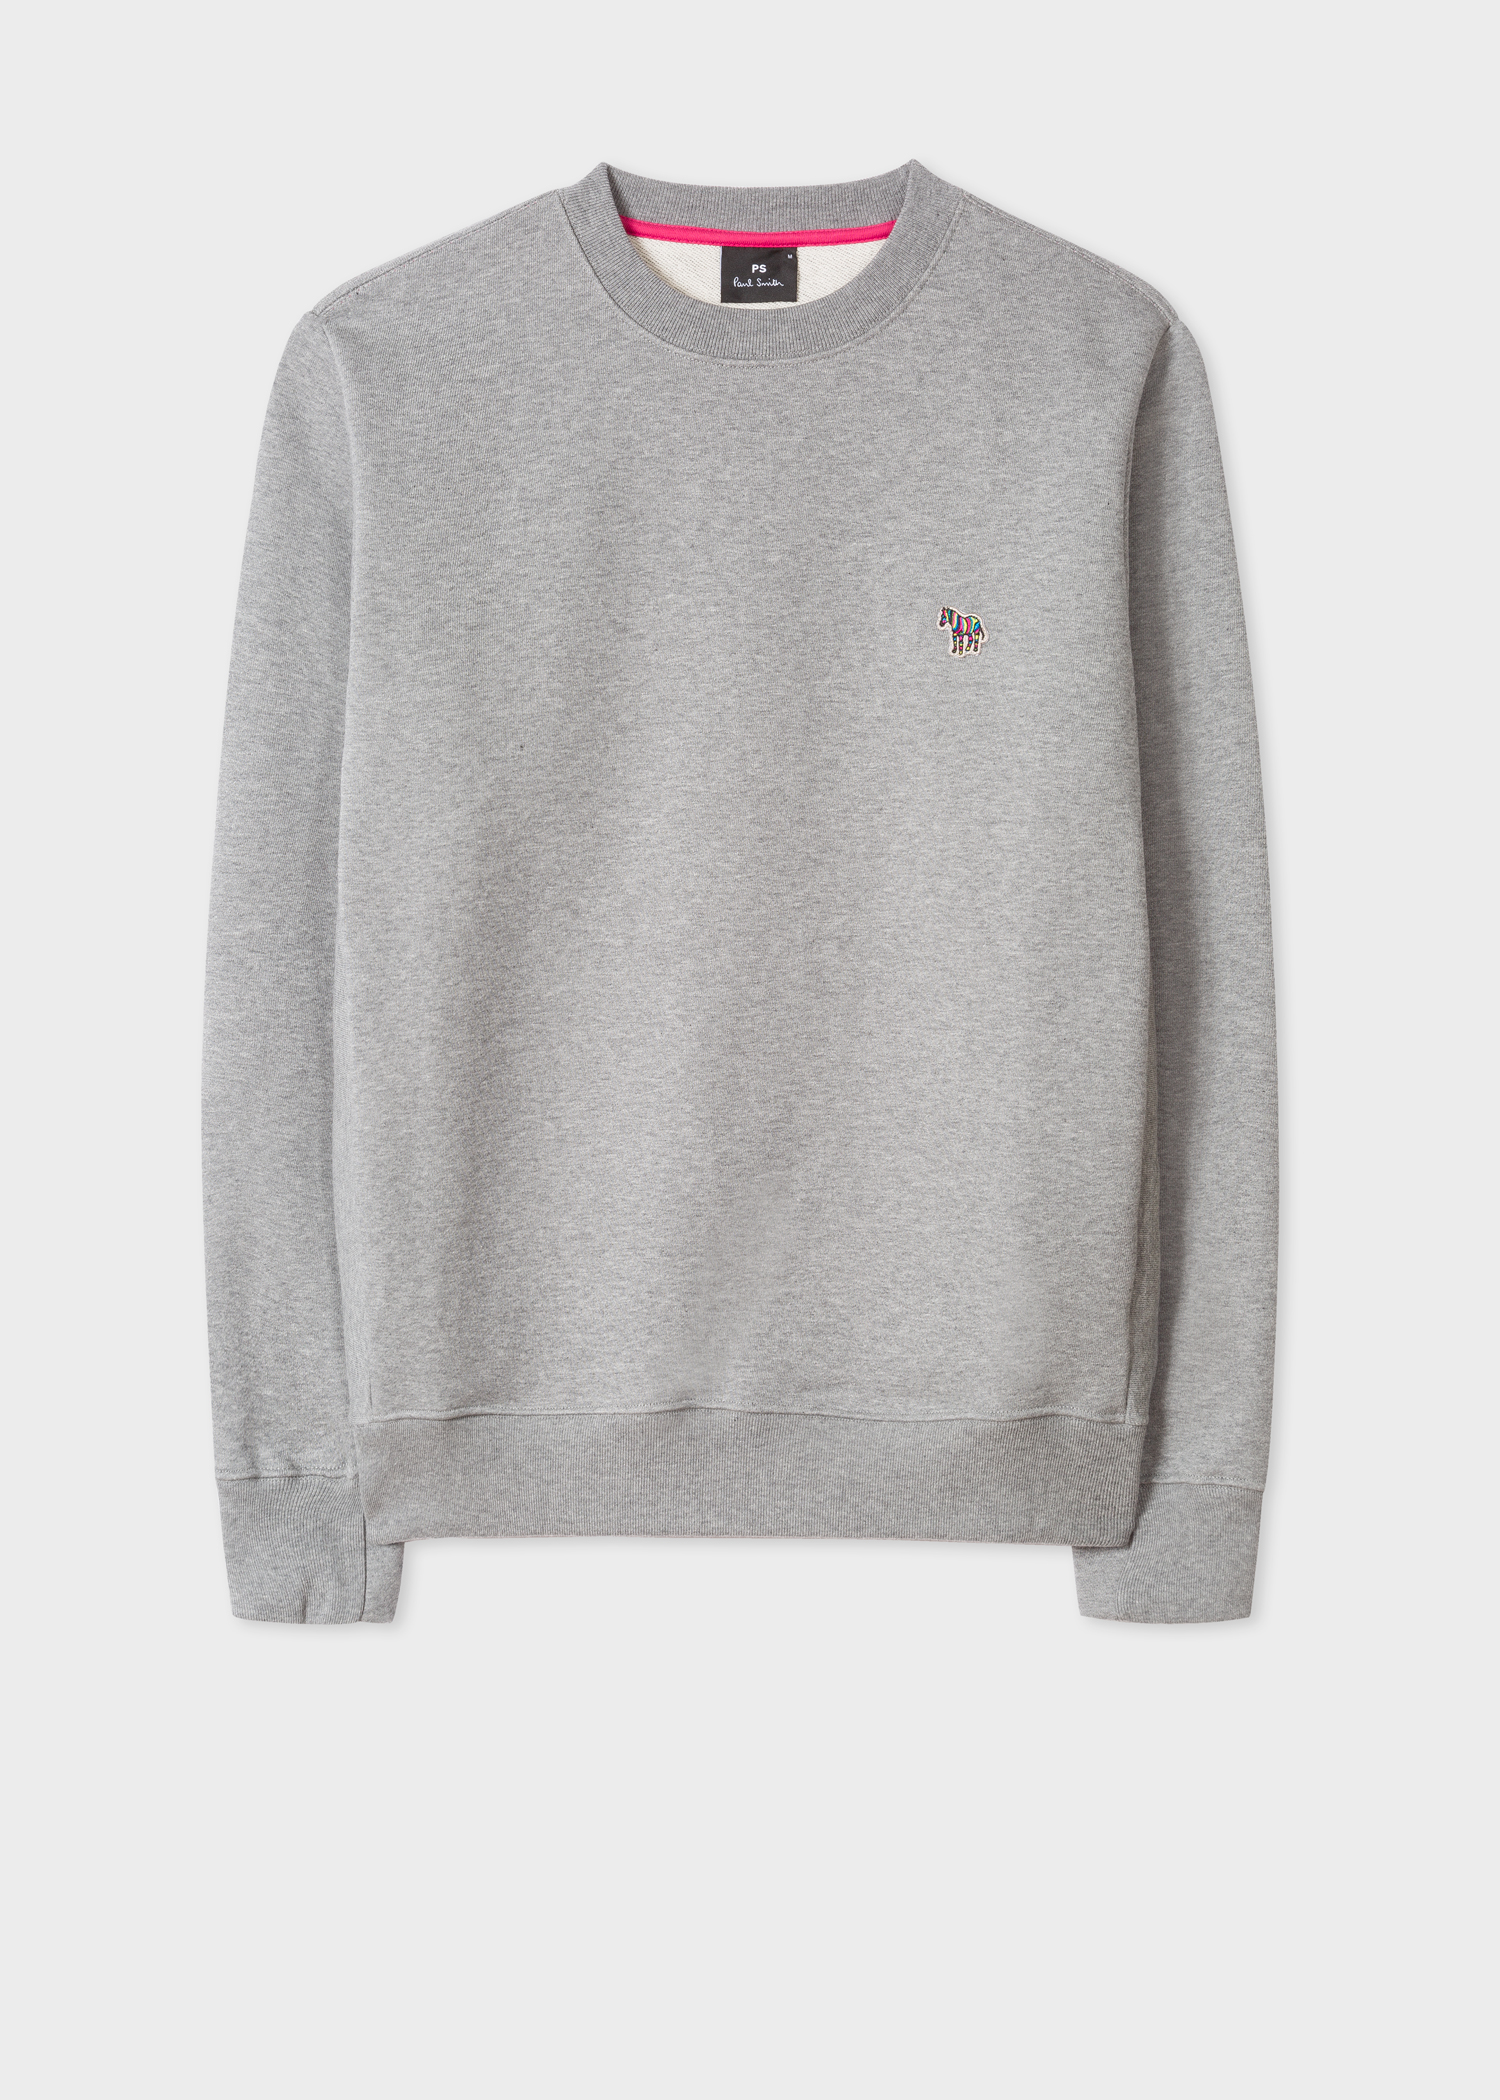 Sweatshirt Smith Cotton Logo Marl Grey Zebra Paul Organic Men's xSqCtYpwx